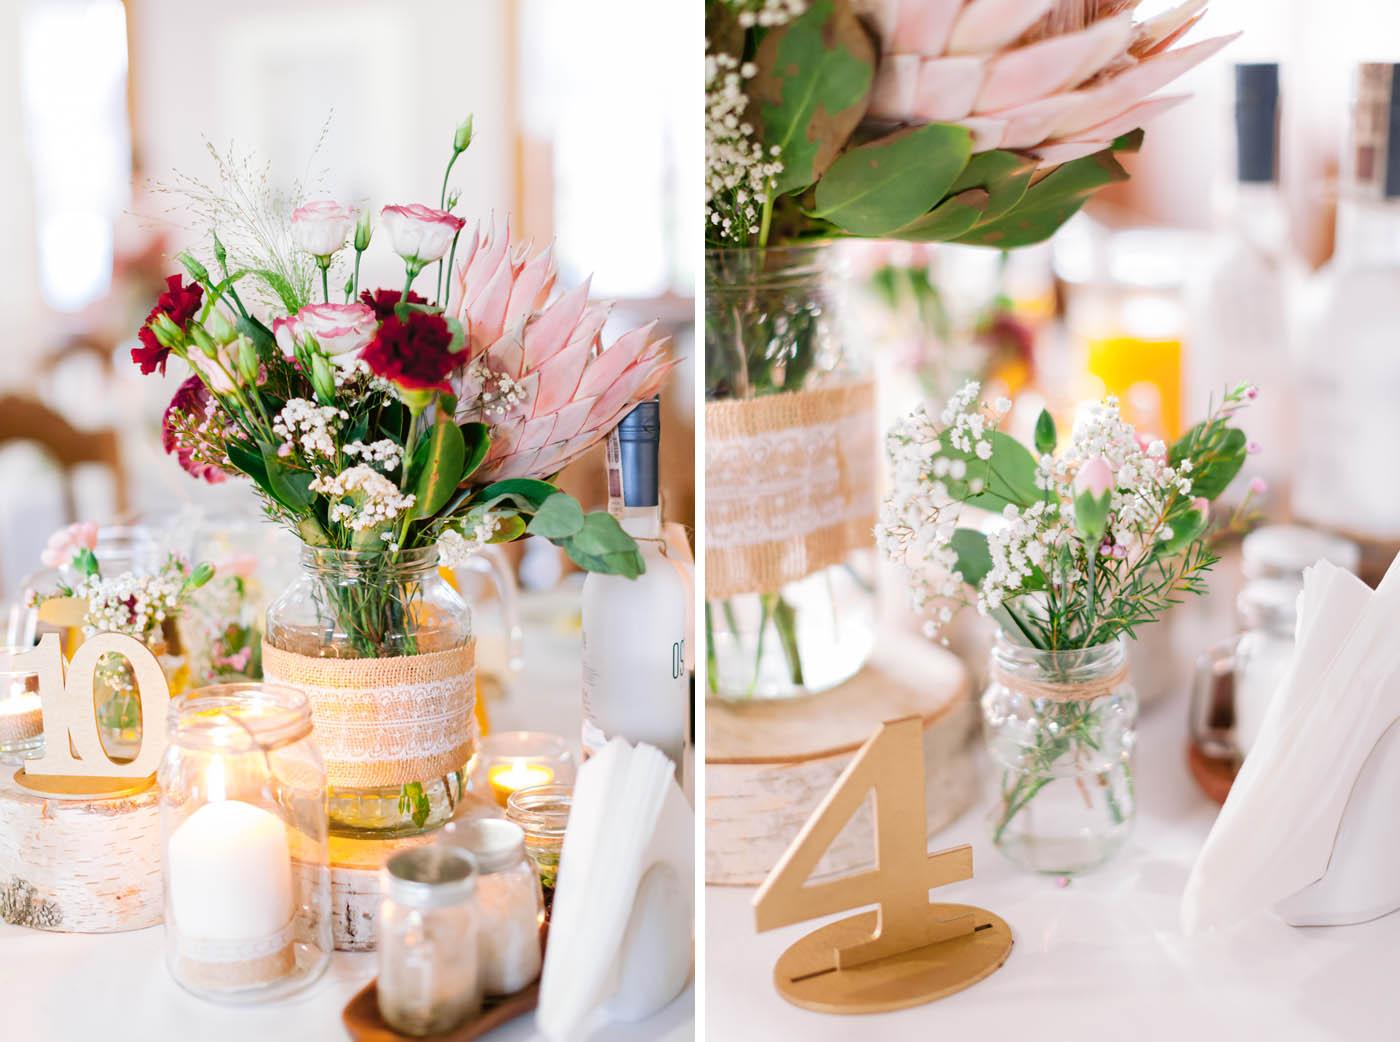 wesele rustykalne kielce